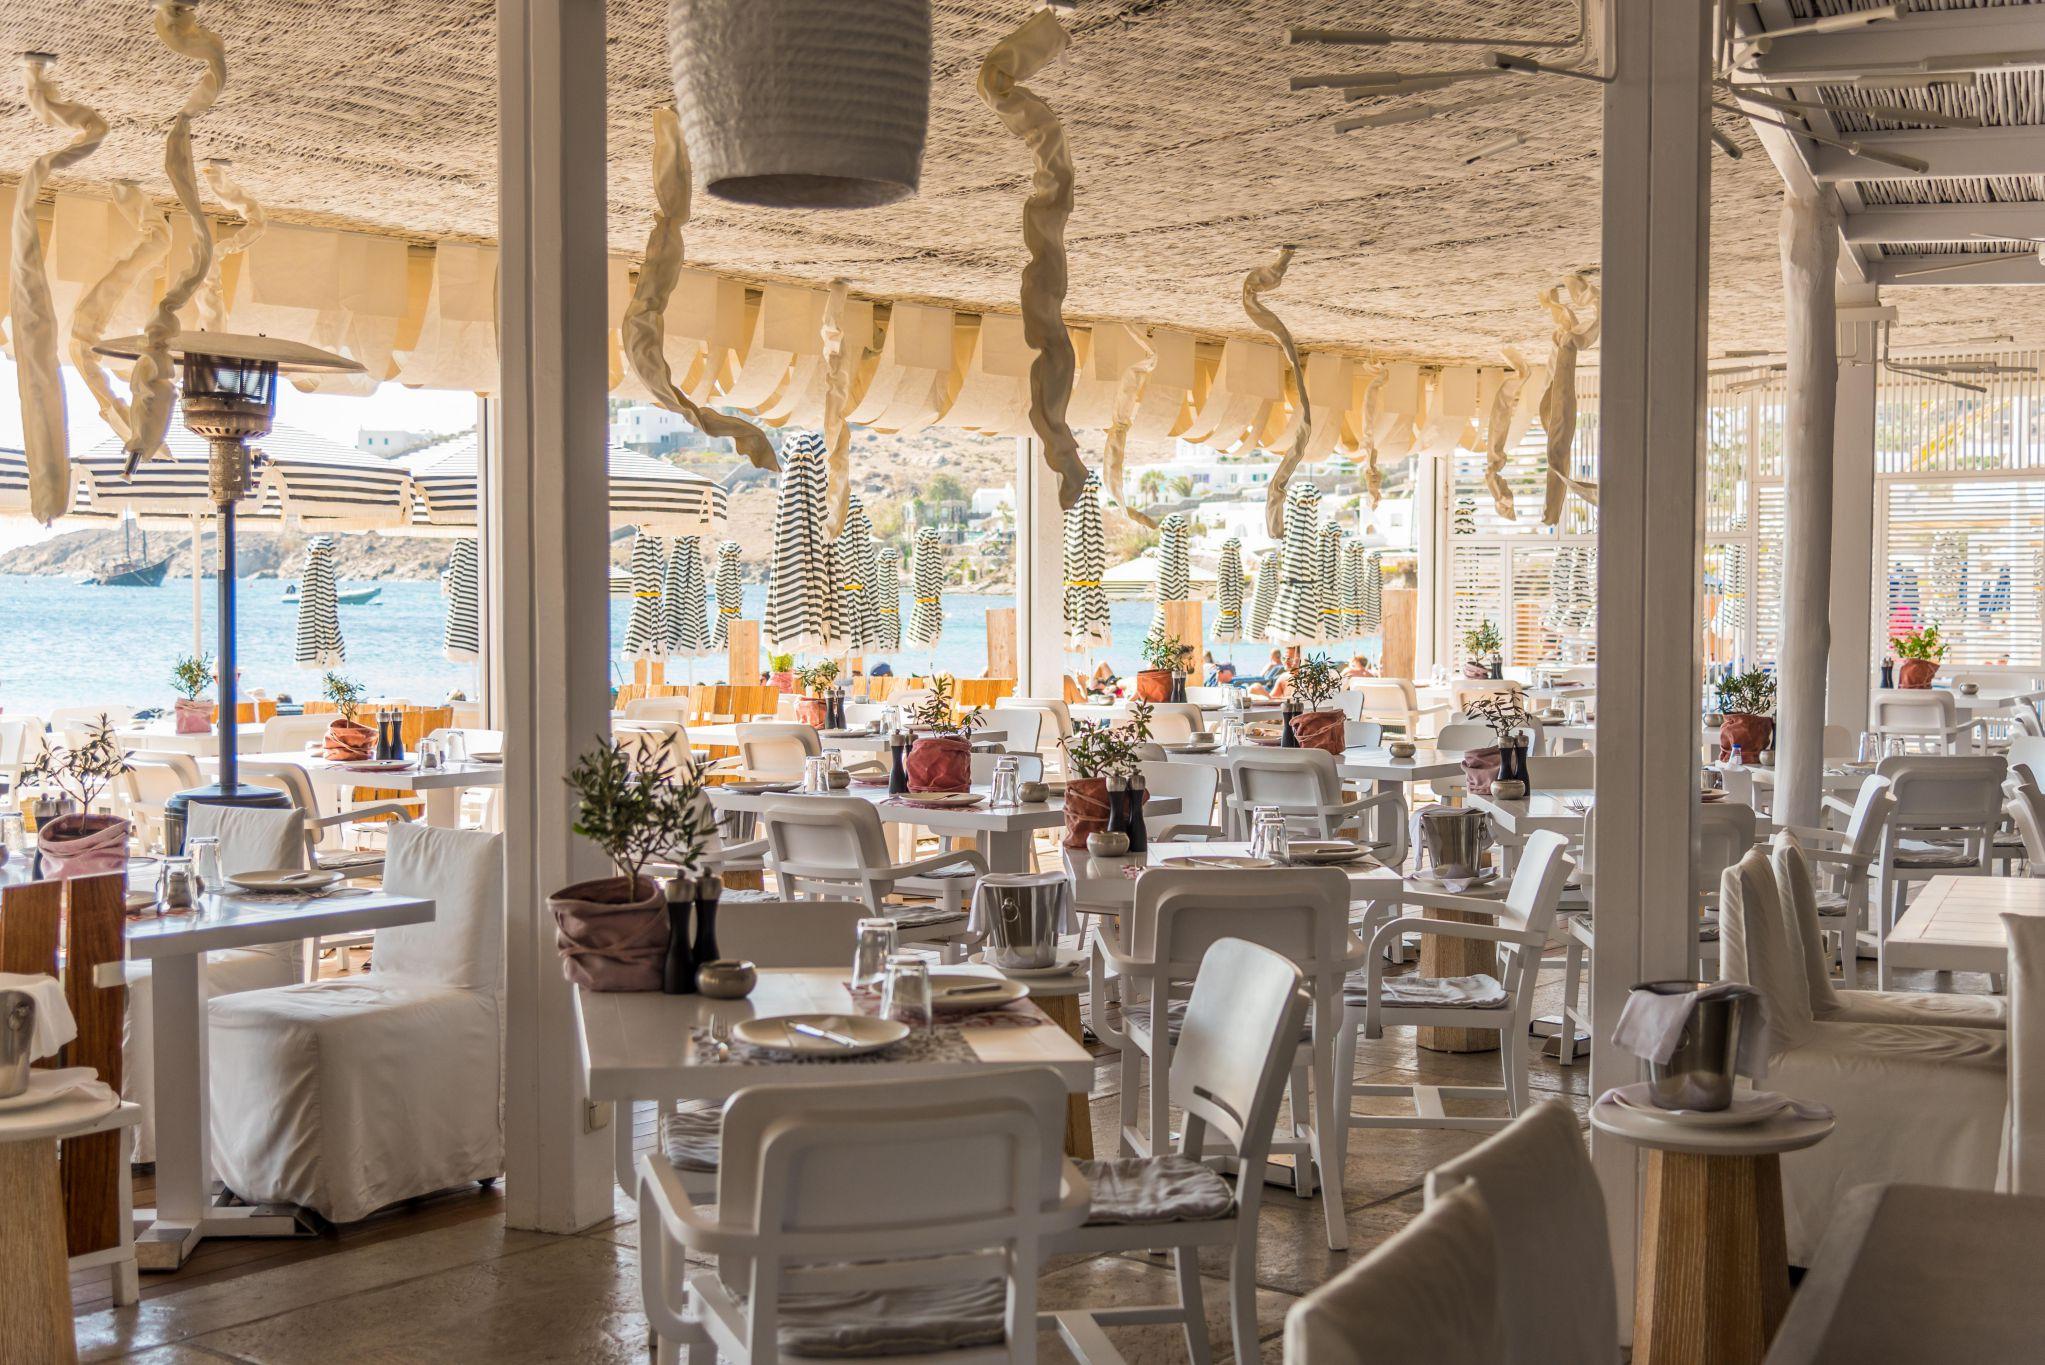 Kuzina beach restaurant Mykonos - Mykonos Best